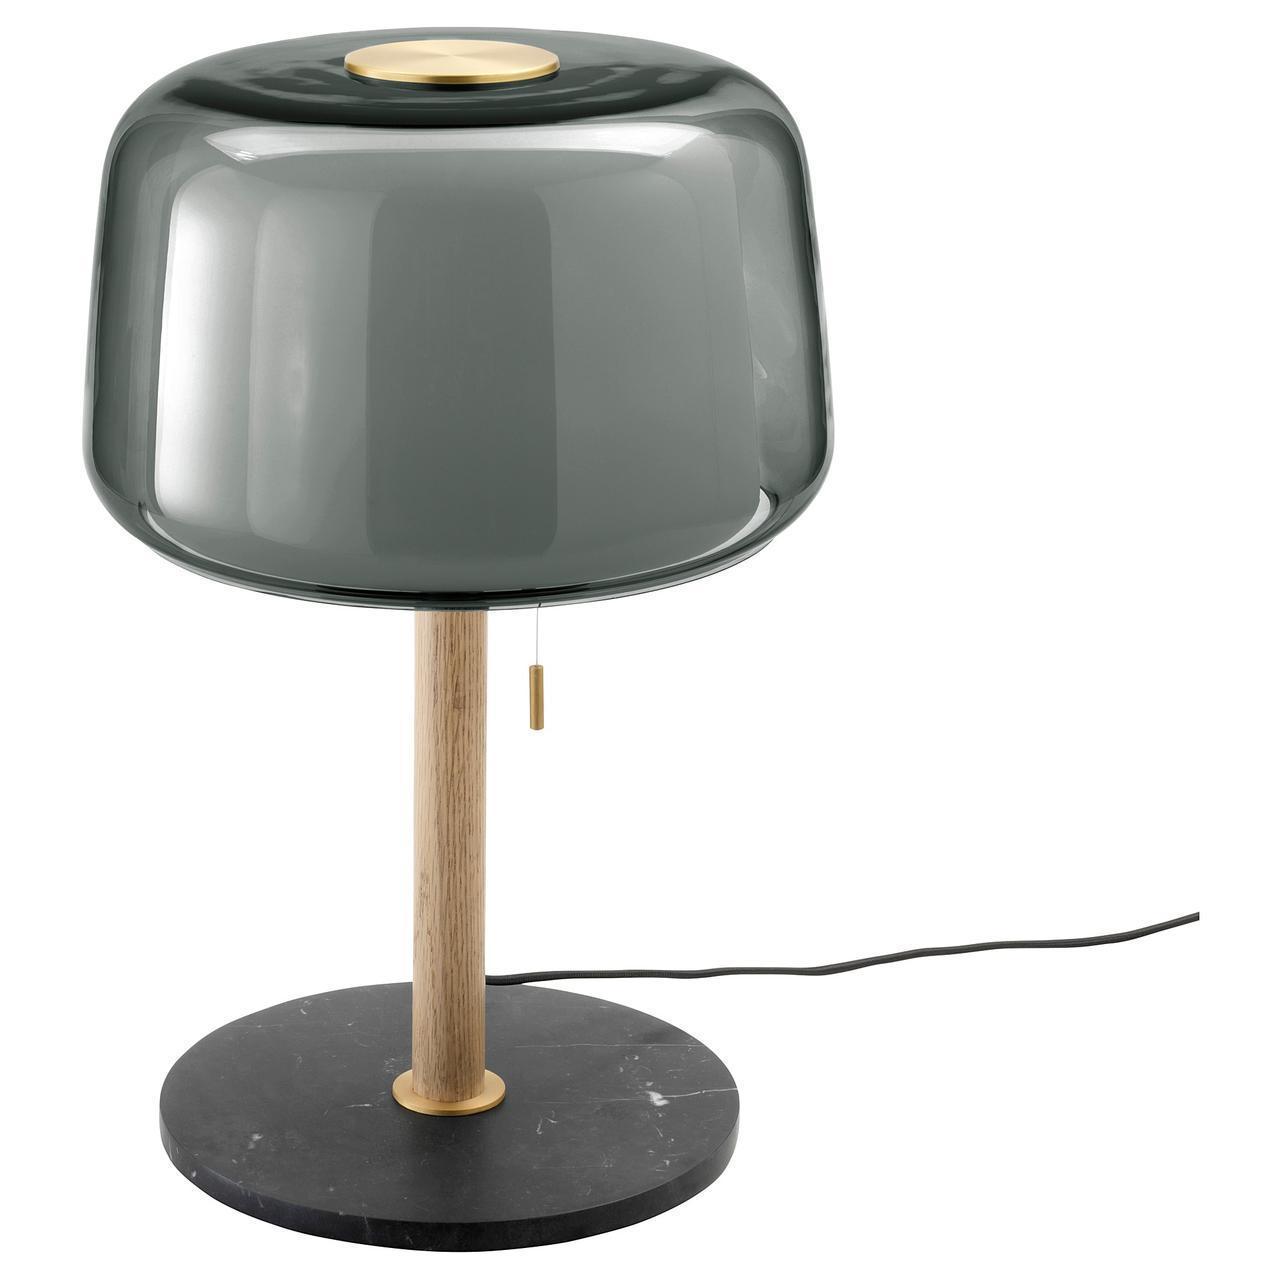 IKEA EVEDAL Наcтольная лампа, серый  (104.057.31)